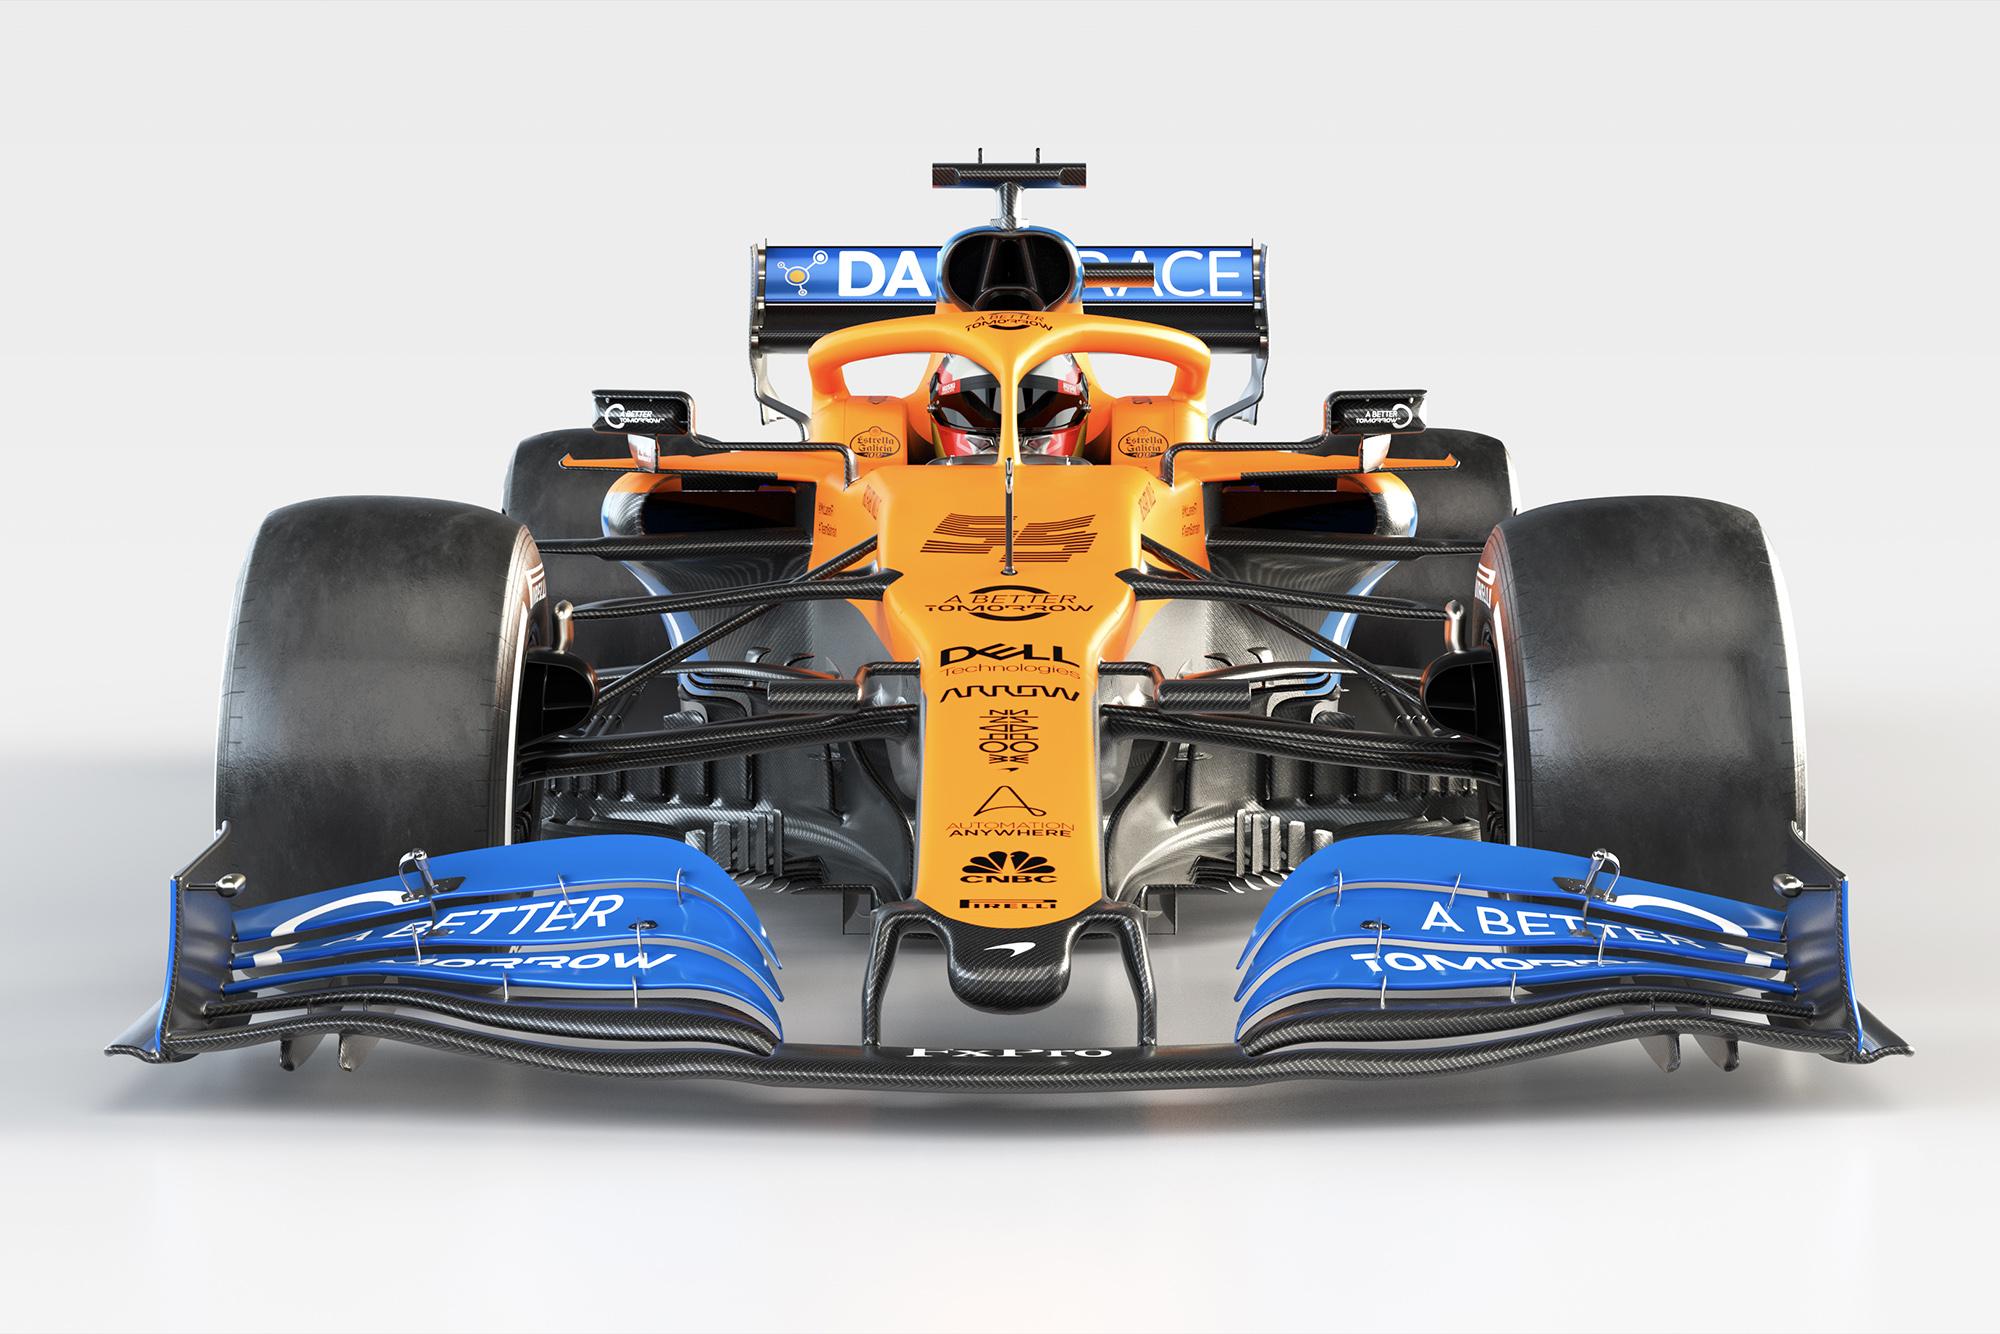 McLaren's 2020 MCL35 breaks cover at Woking